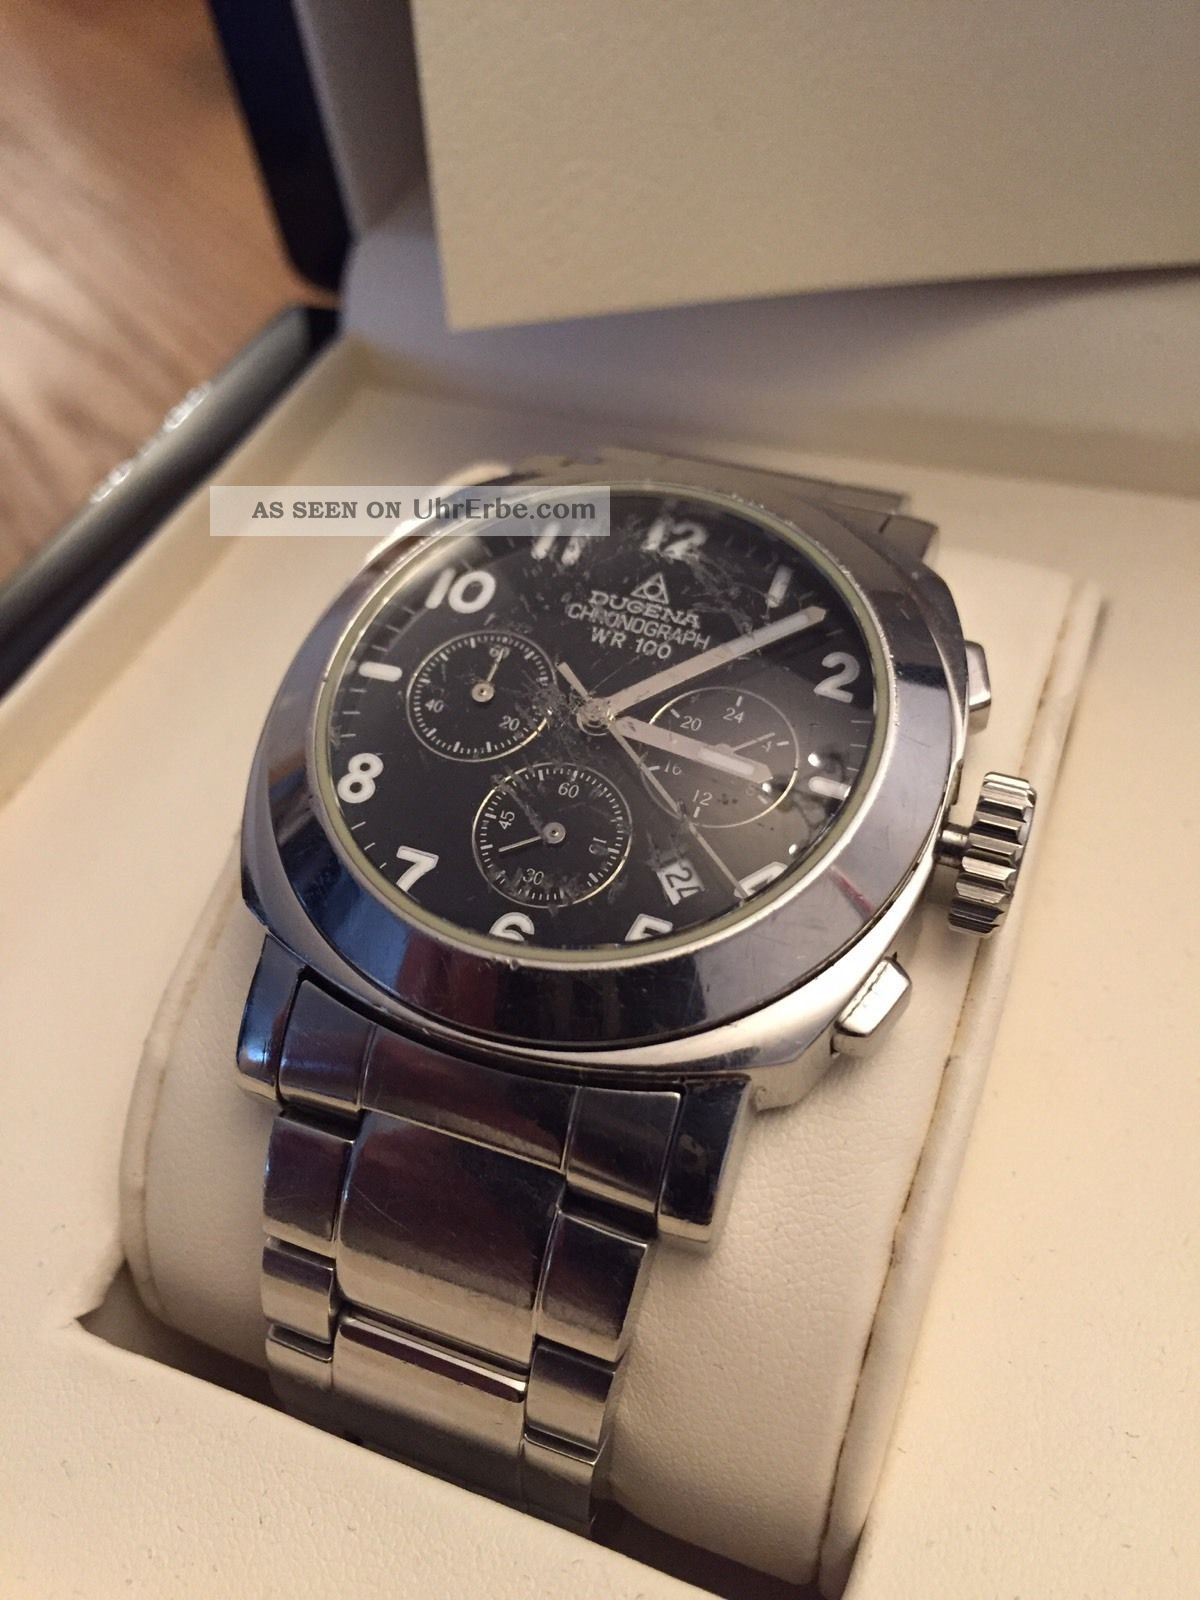 Dugena Chronograph Wr100 Militare,  40mm,  Edelstahl Armbanduhren Bild